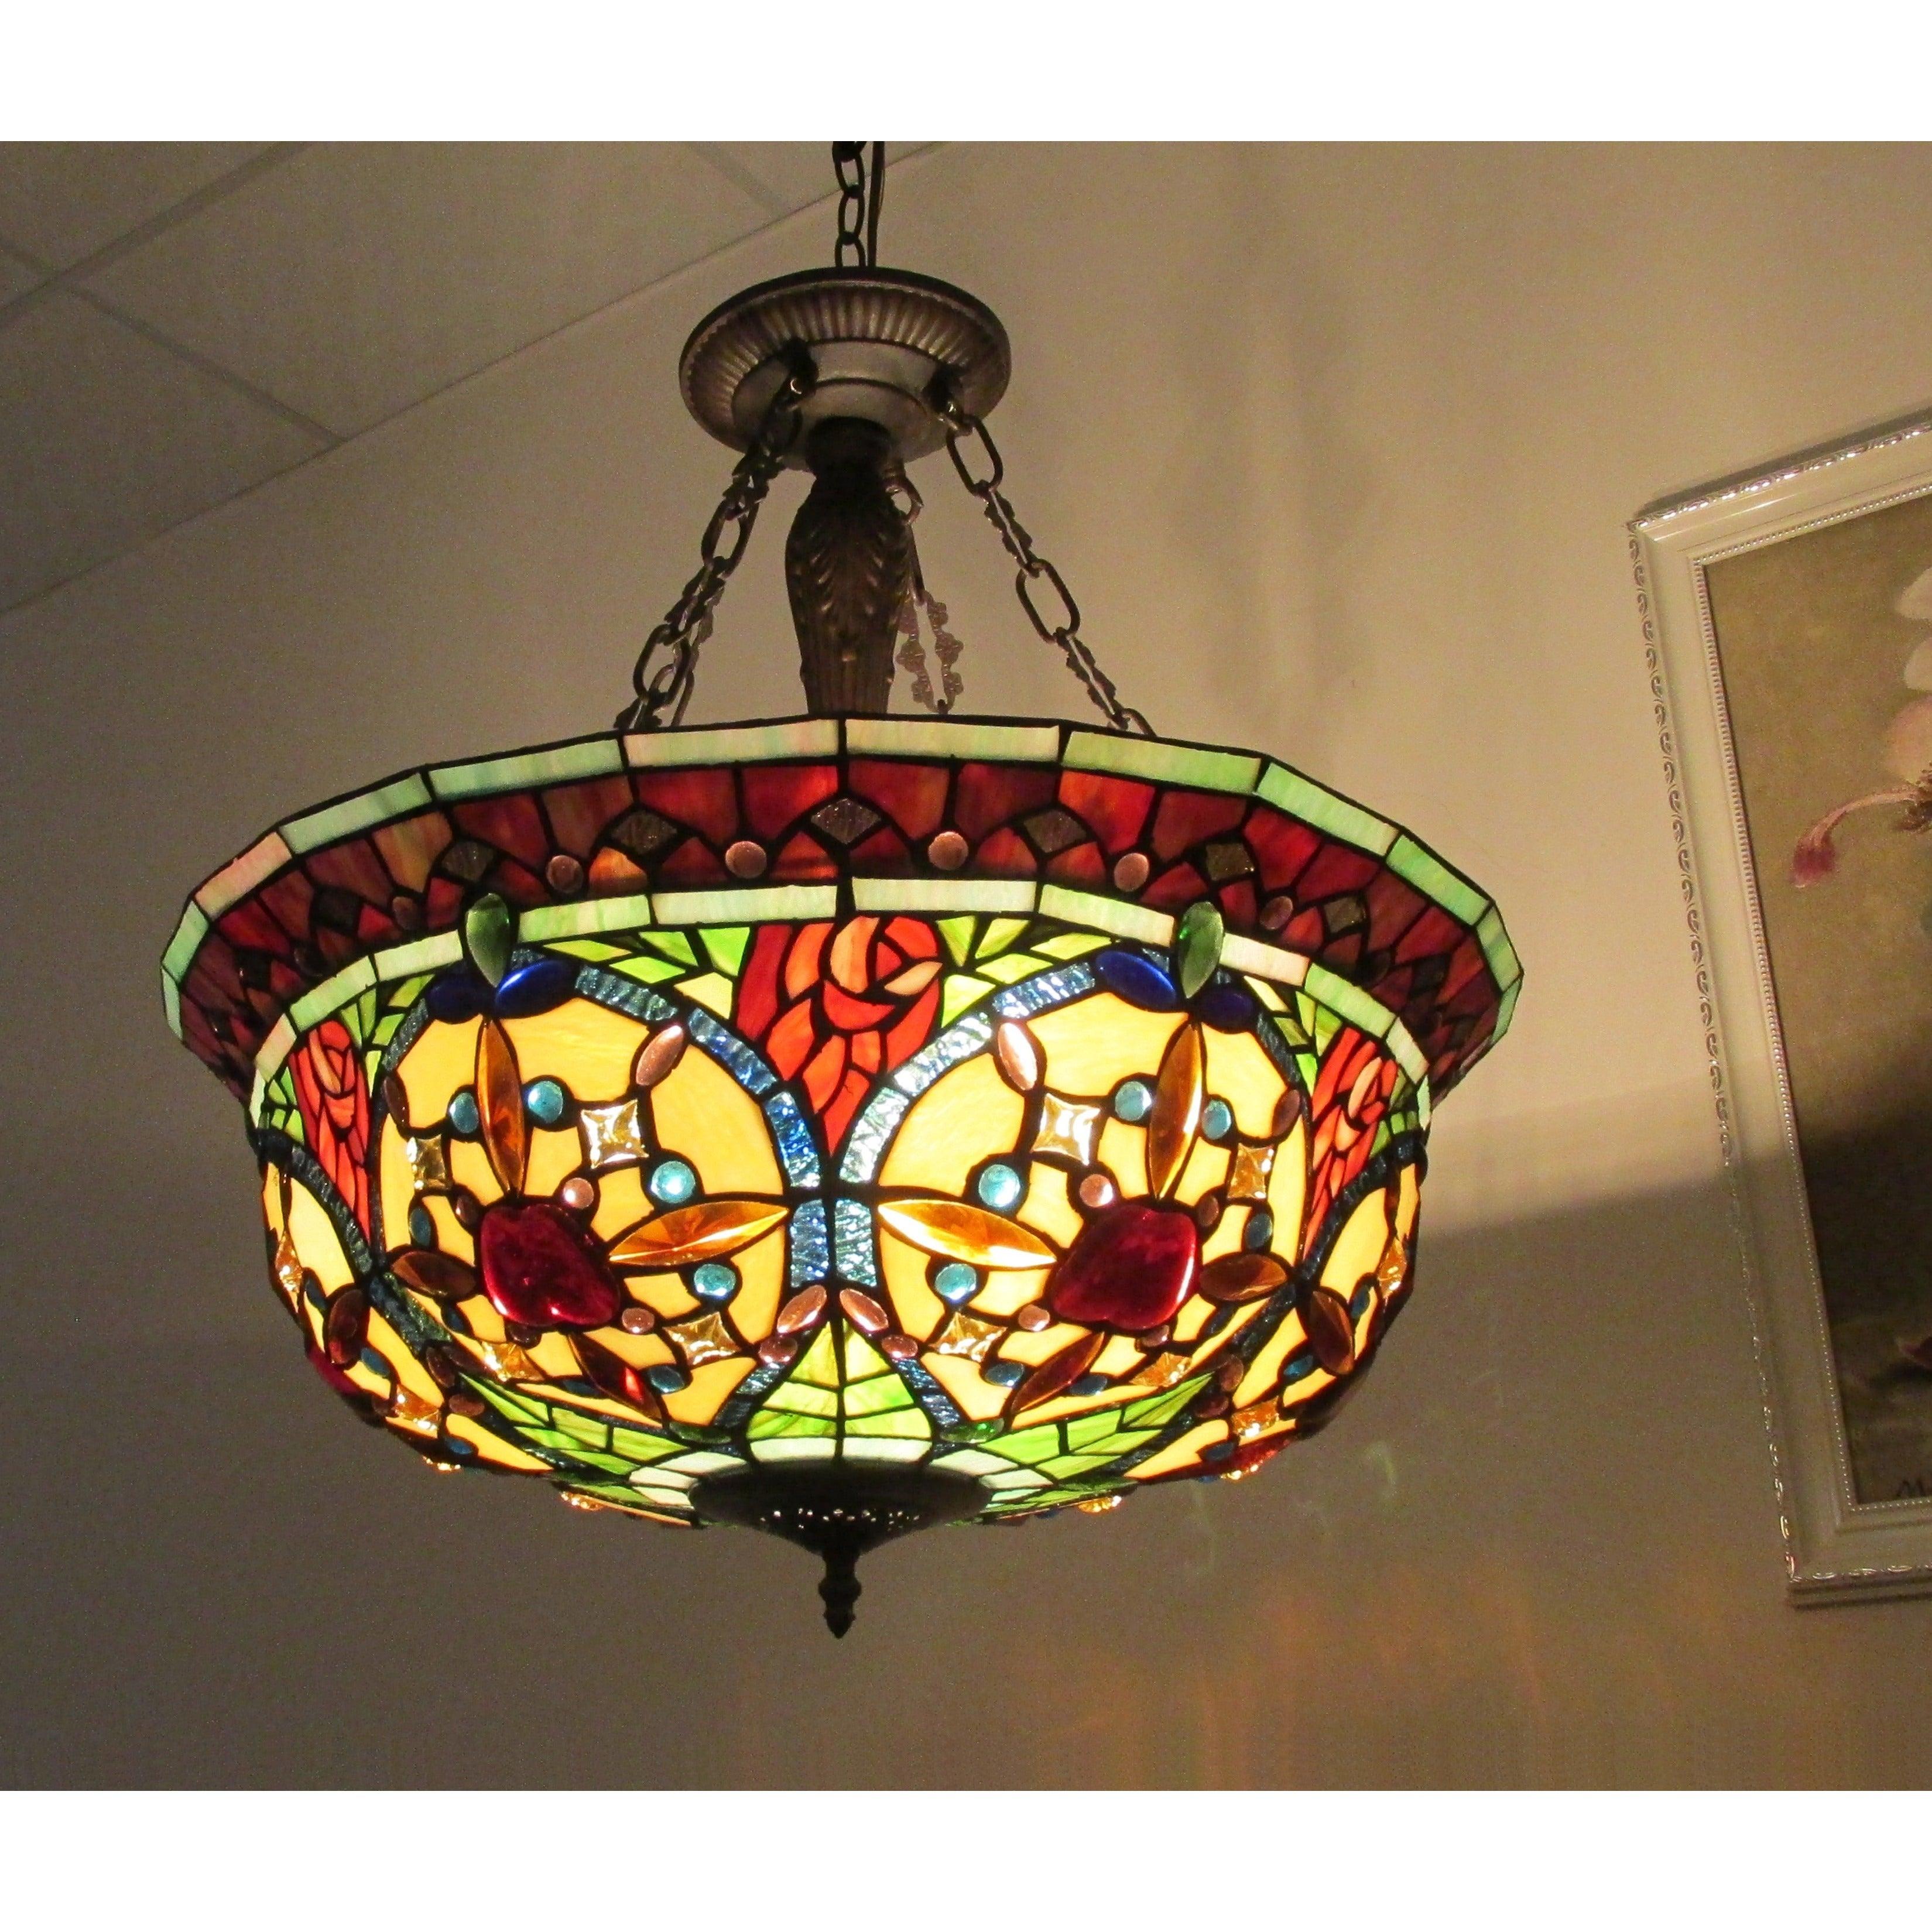 Shop Black Friday Deals On Tiffany Style 3 Light Floral Motif Inverted Pendant Overstock 8757617